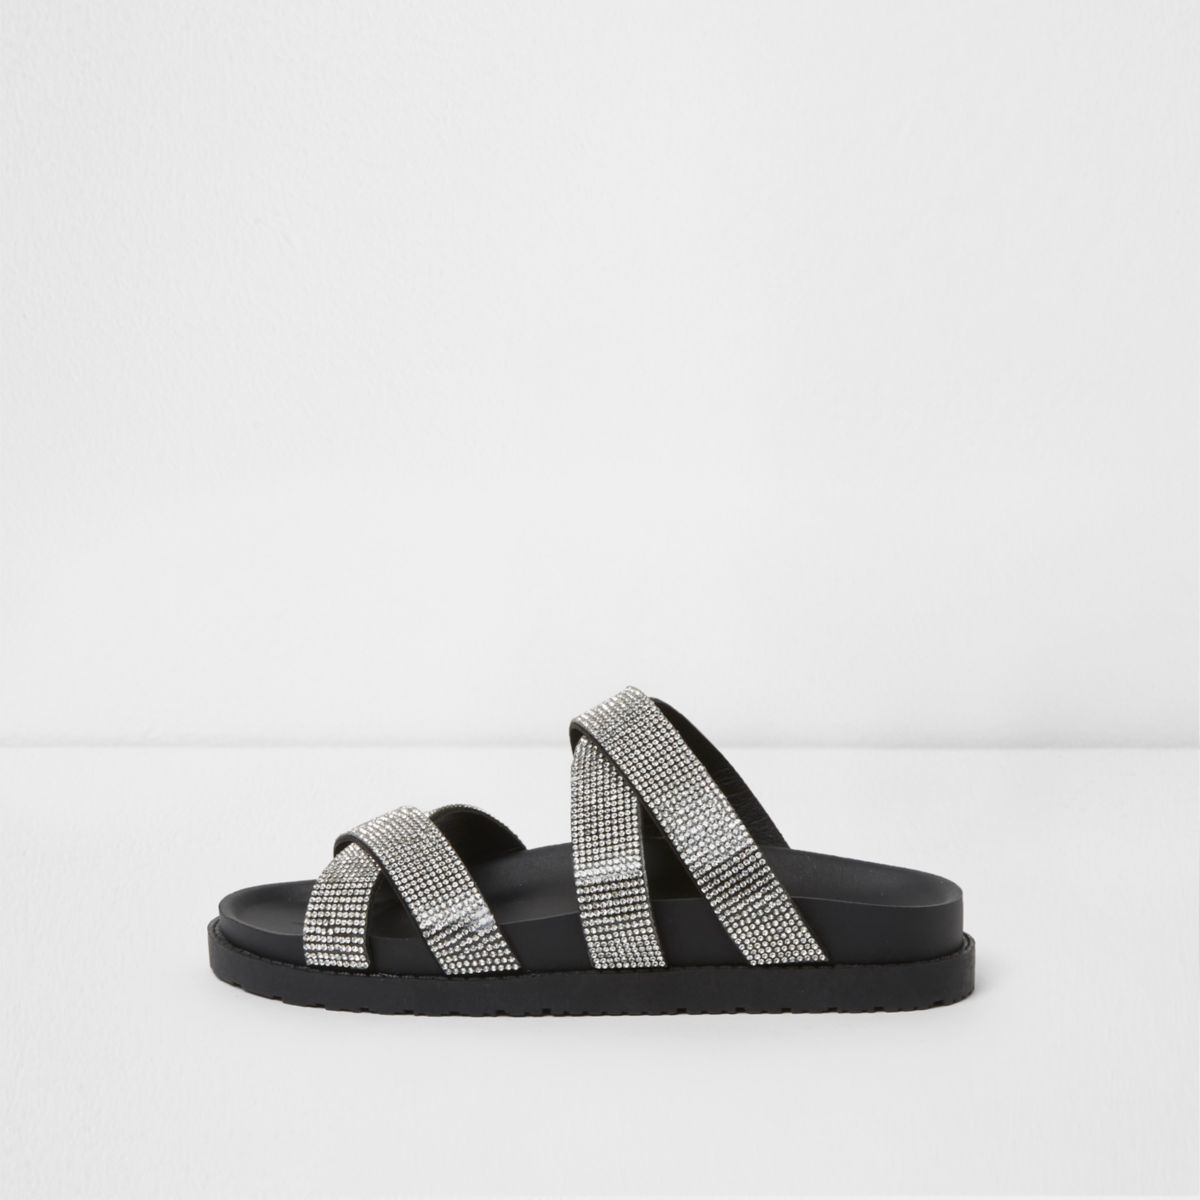 Black heatseal stud cross strap sliders